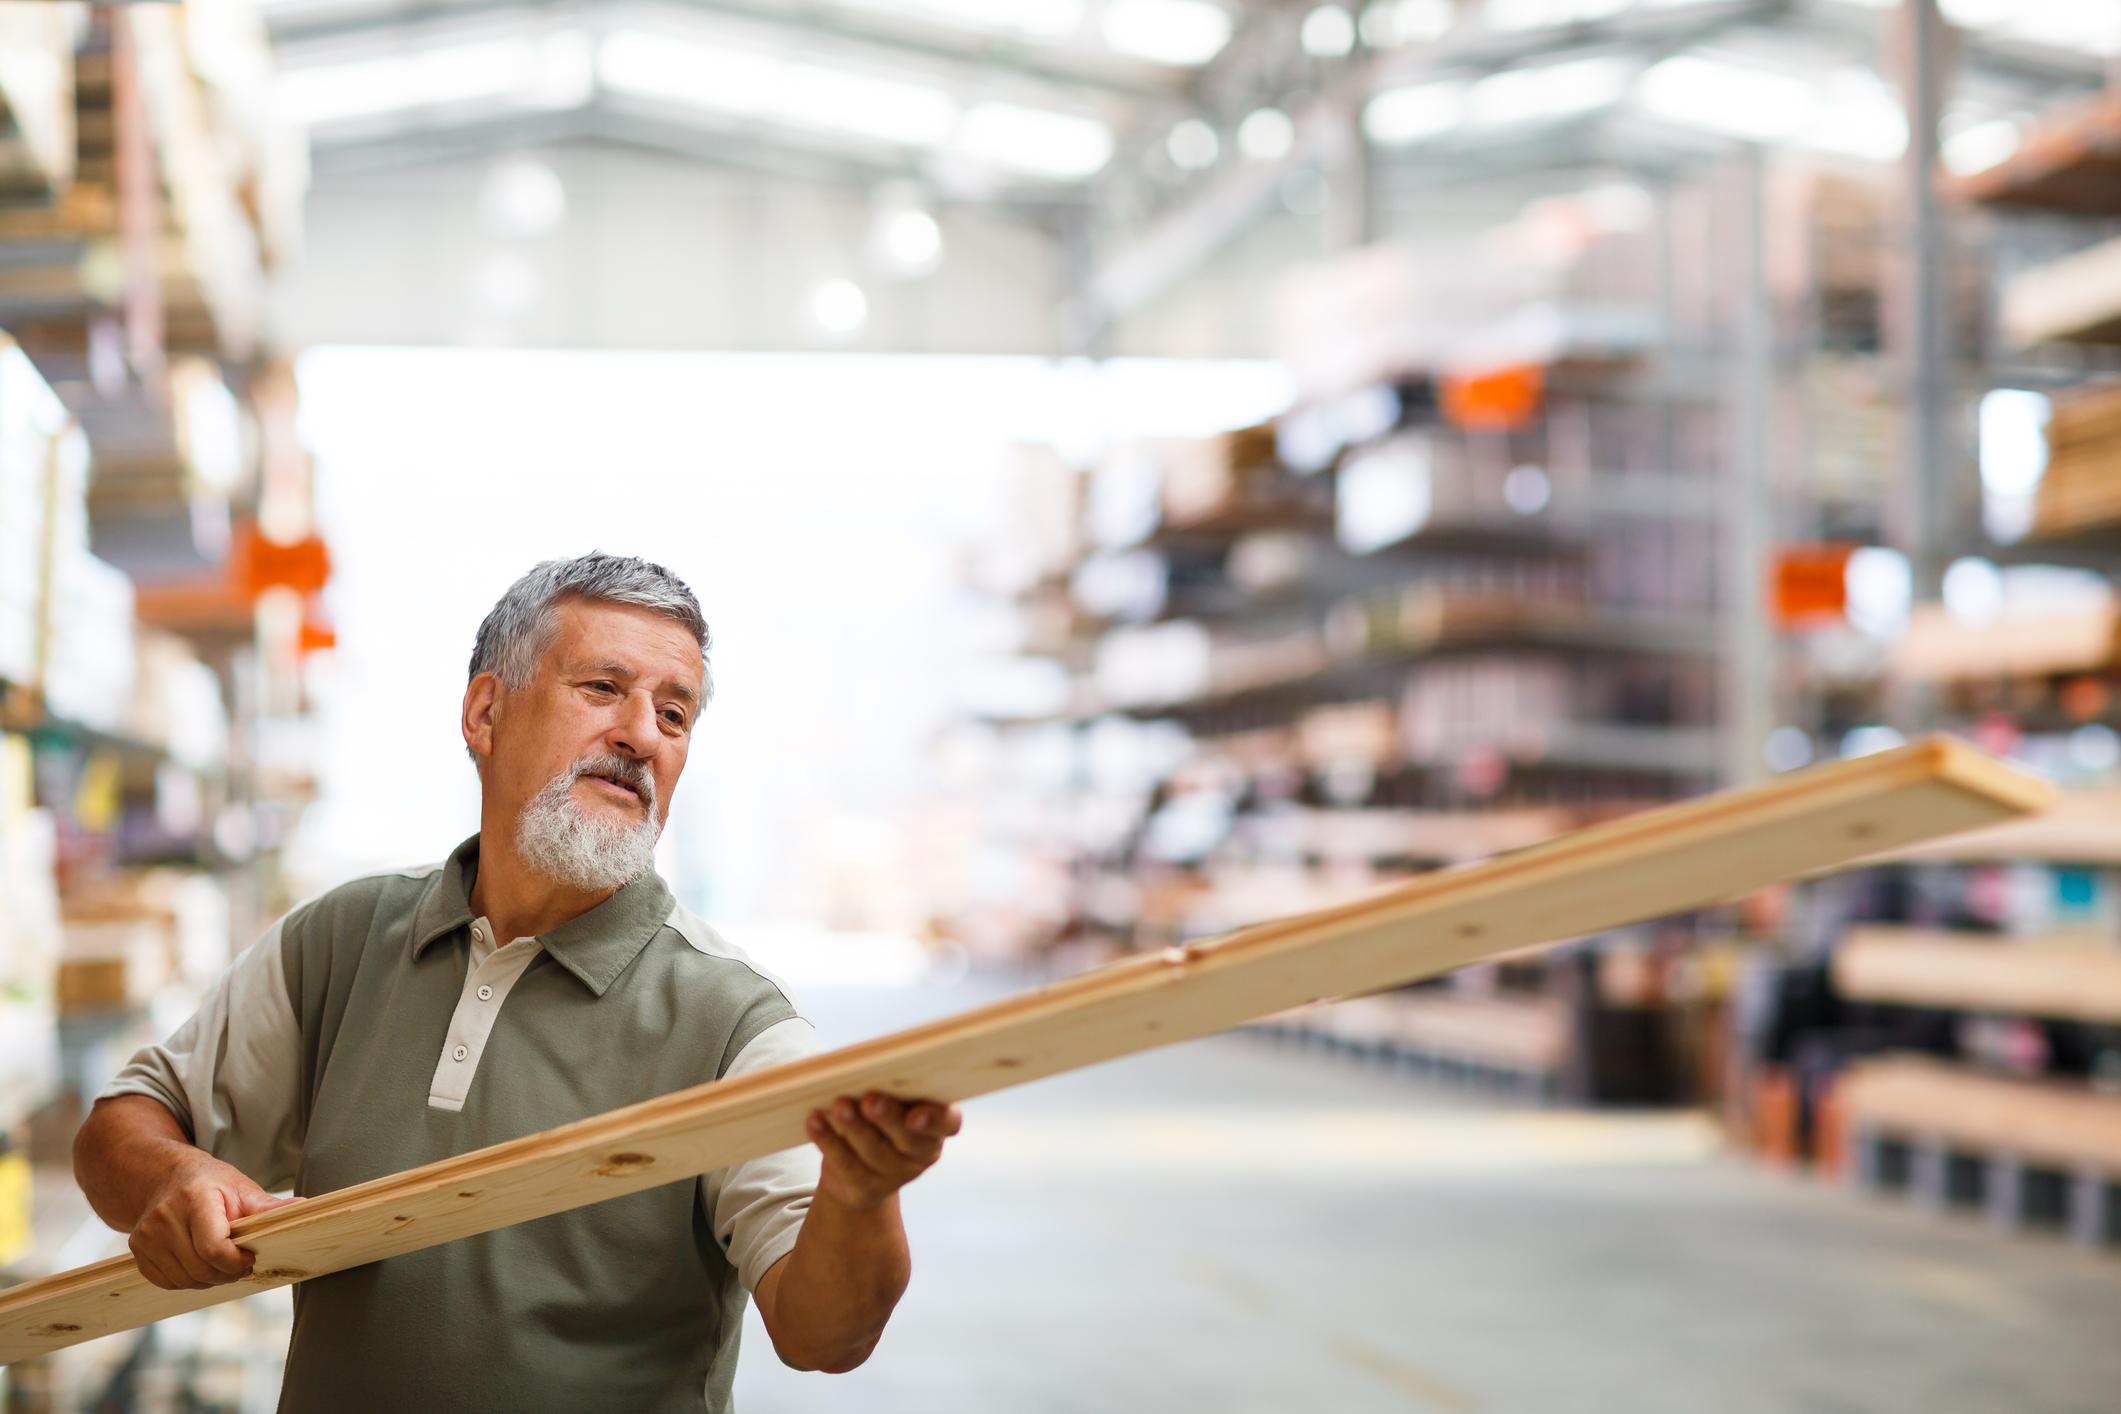 A home improvement customer inspects a piece of lumber.